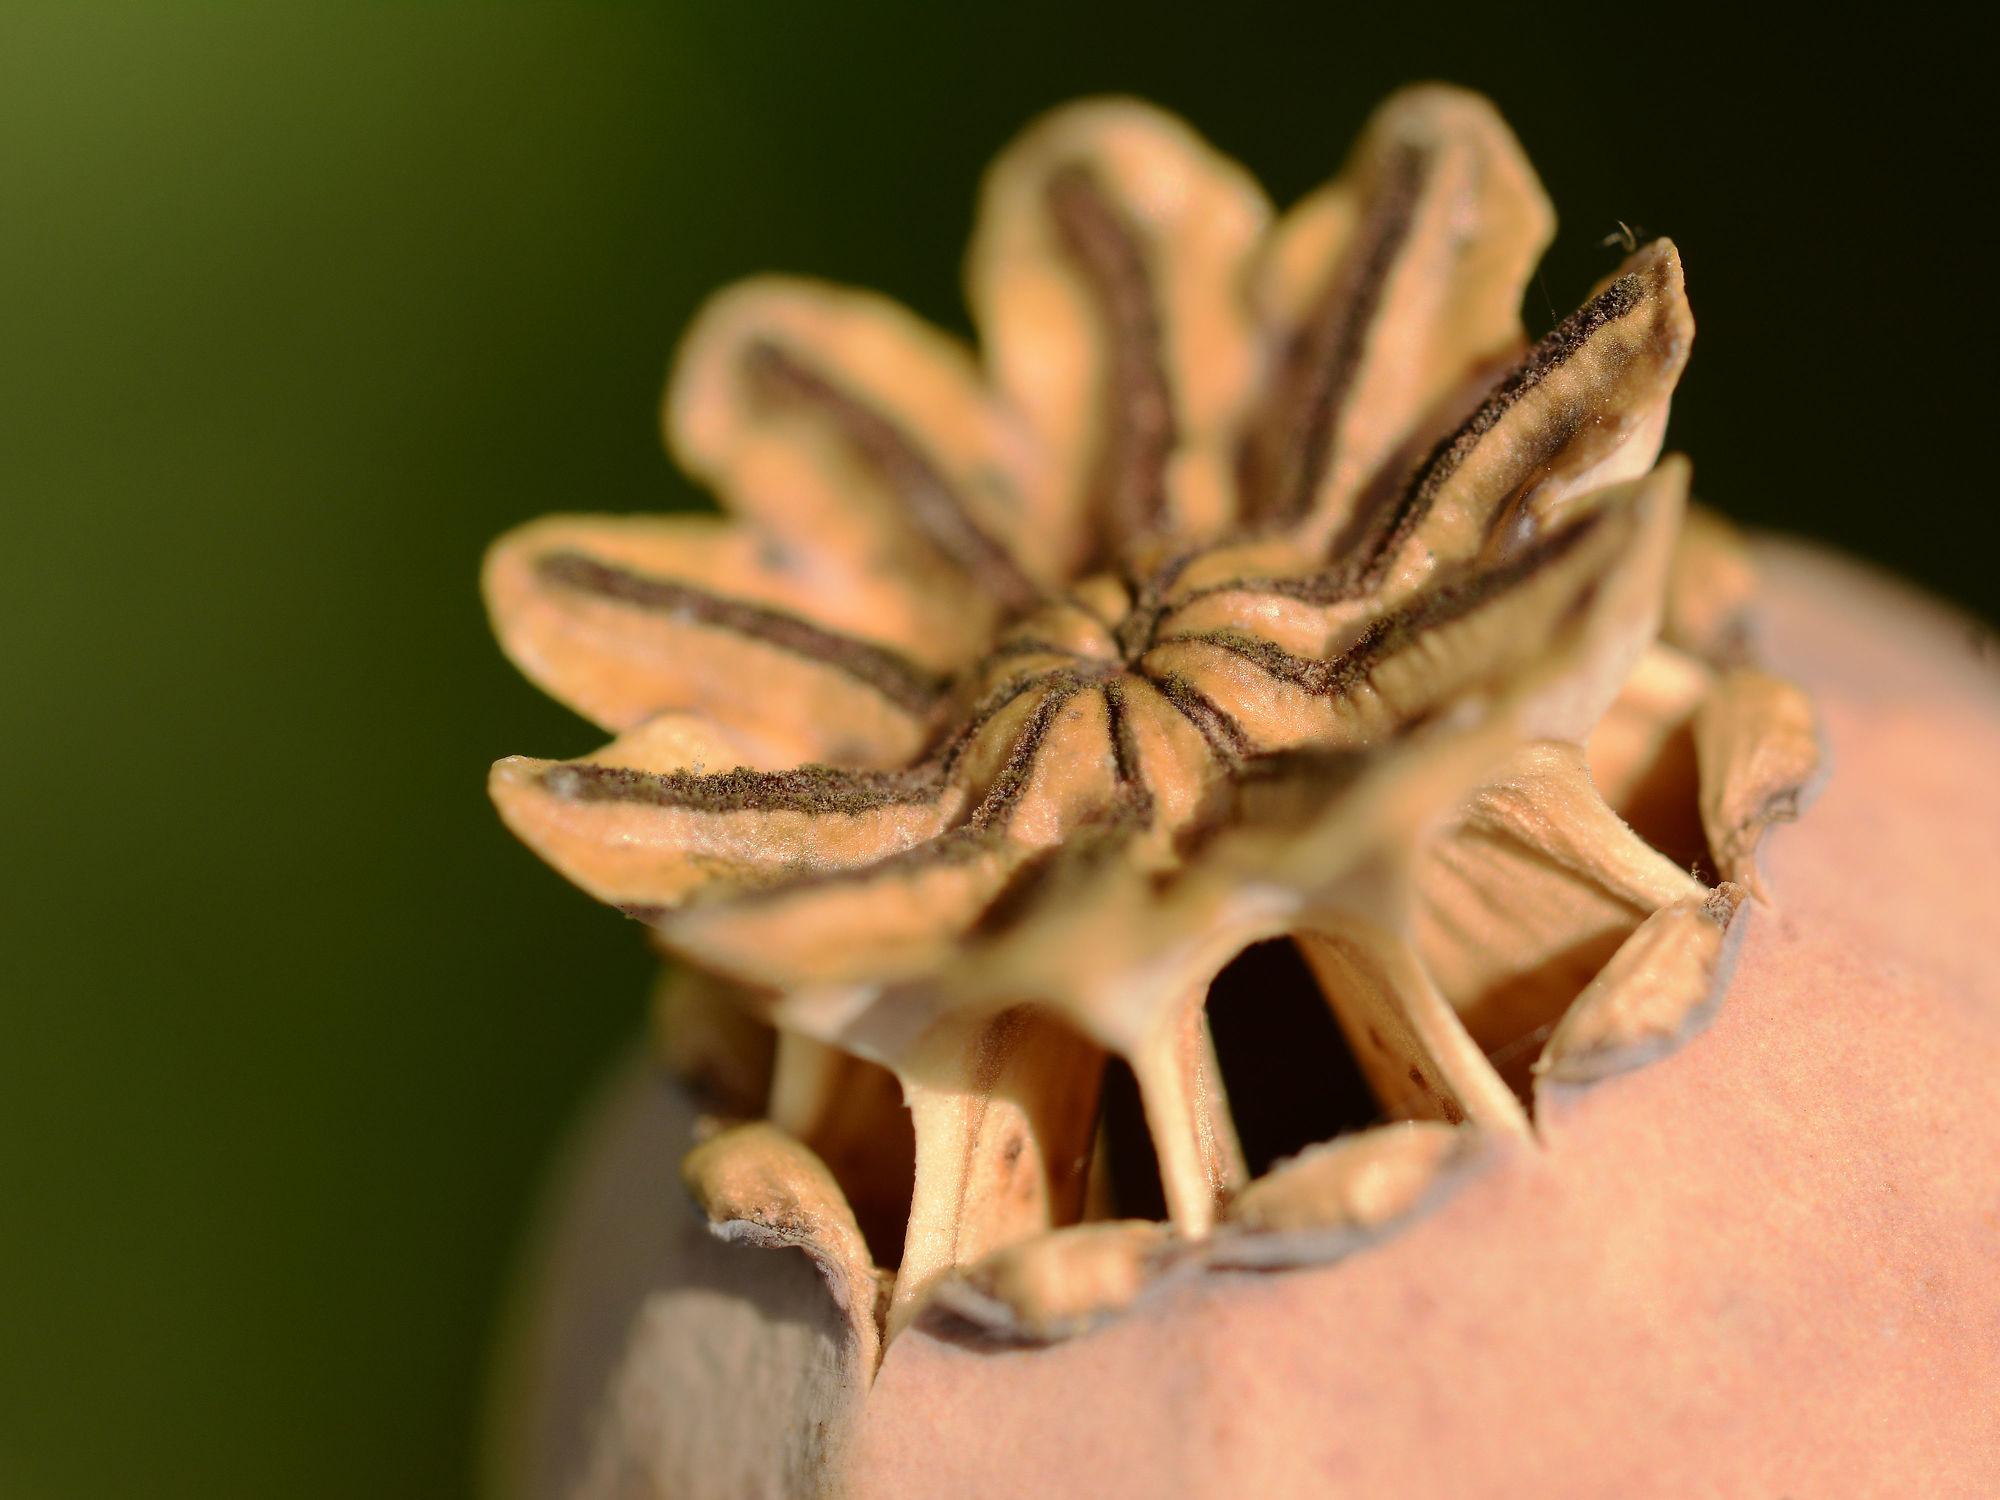 Bild mit Grün, Mohn, Braun, Makro, nahaufnahme, Samen, Mohnkapsel, Vermehrung, Reife, Rieselöffnungen